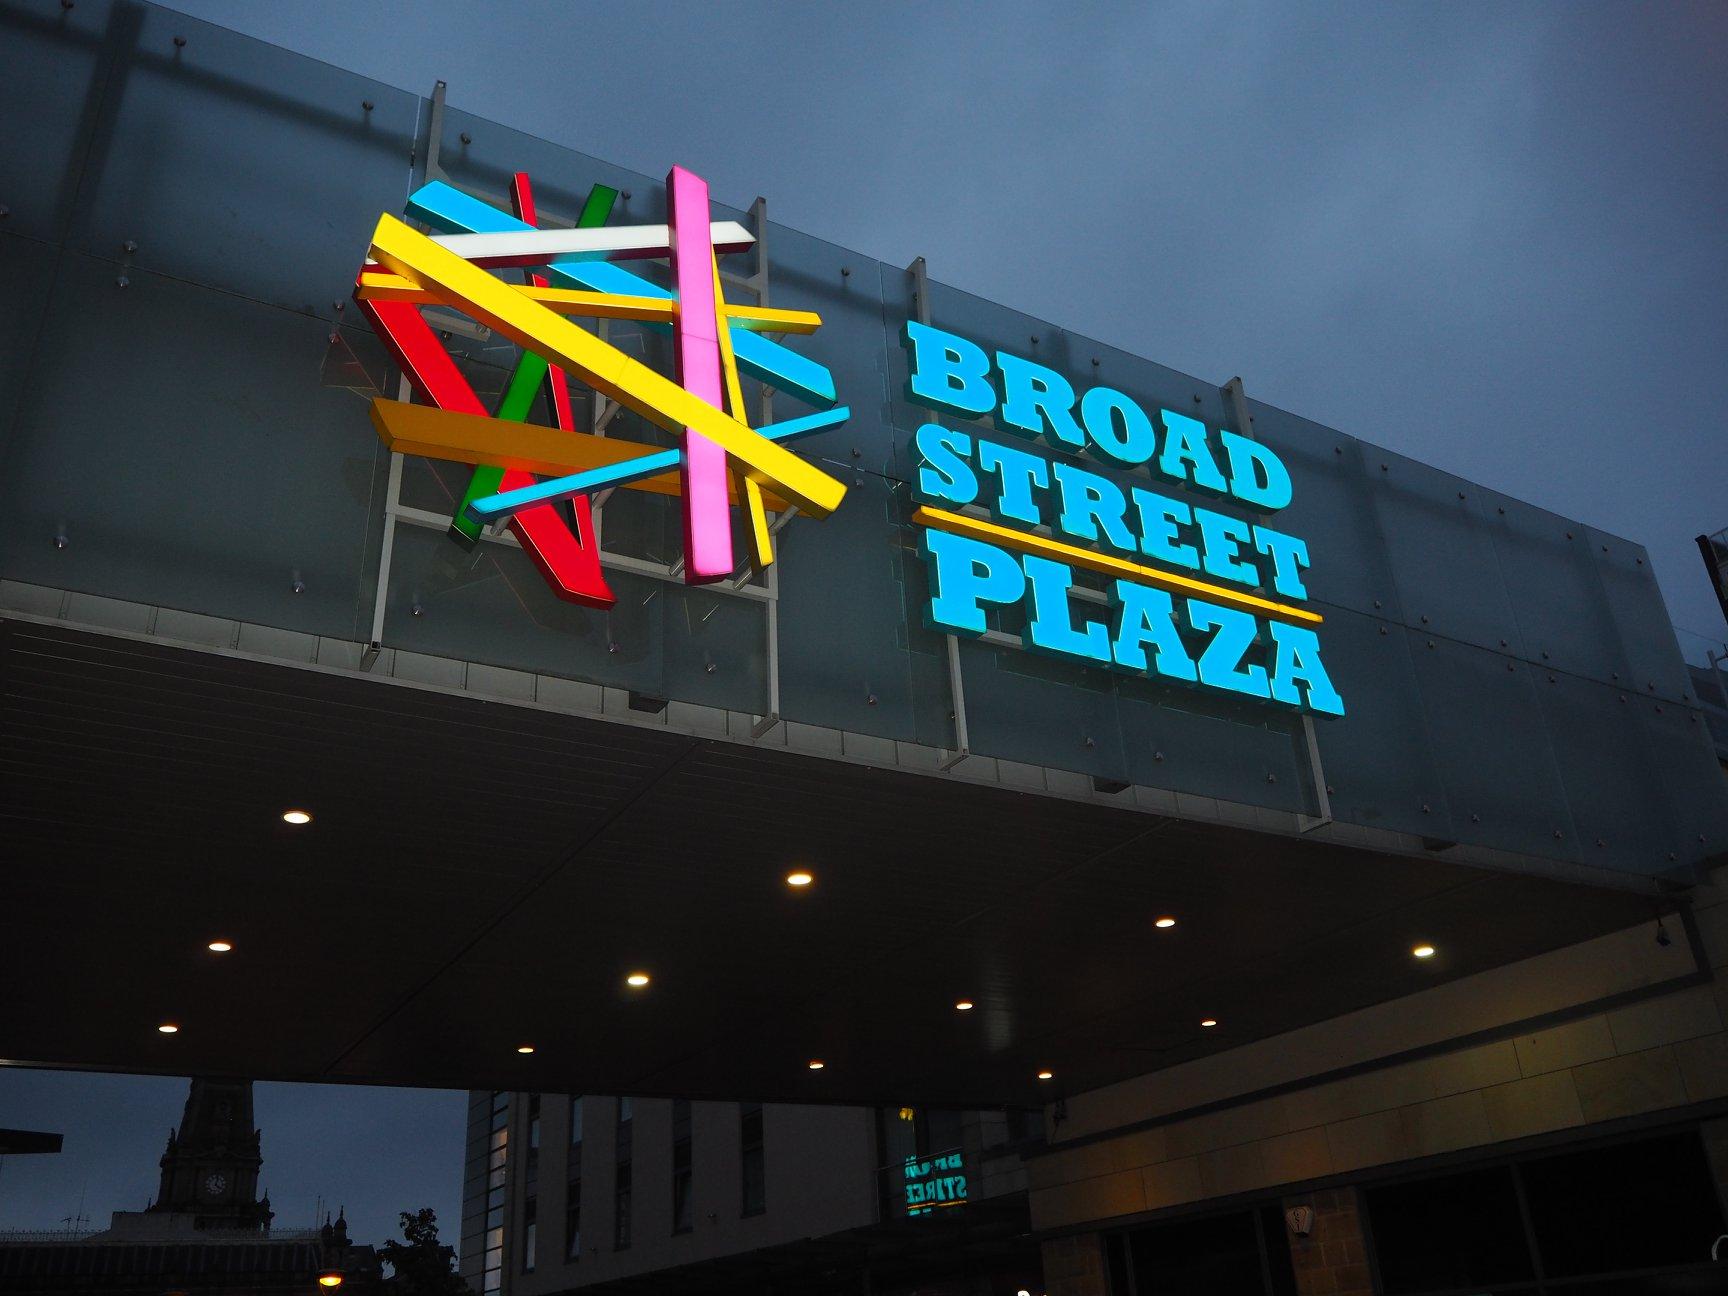 Broadstreet Plaza